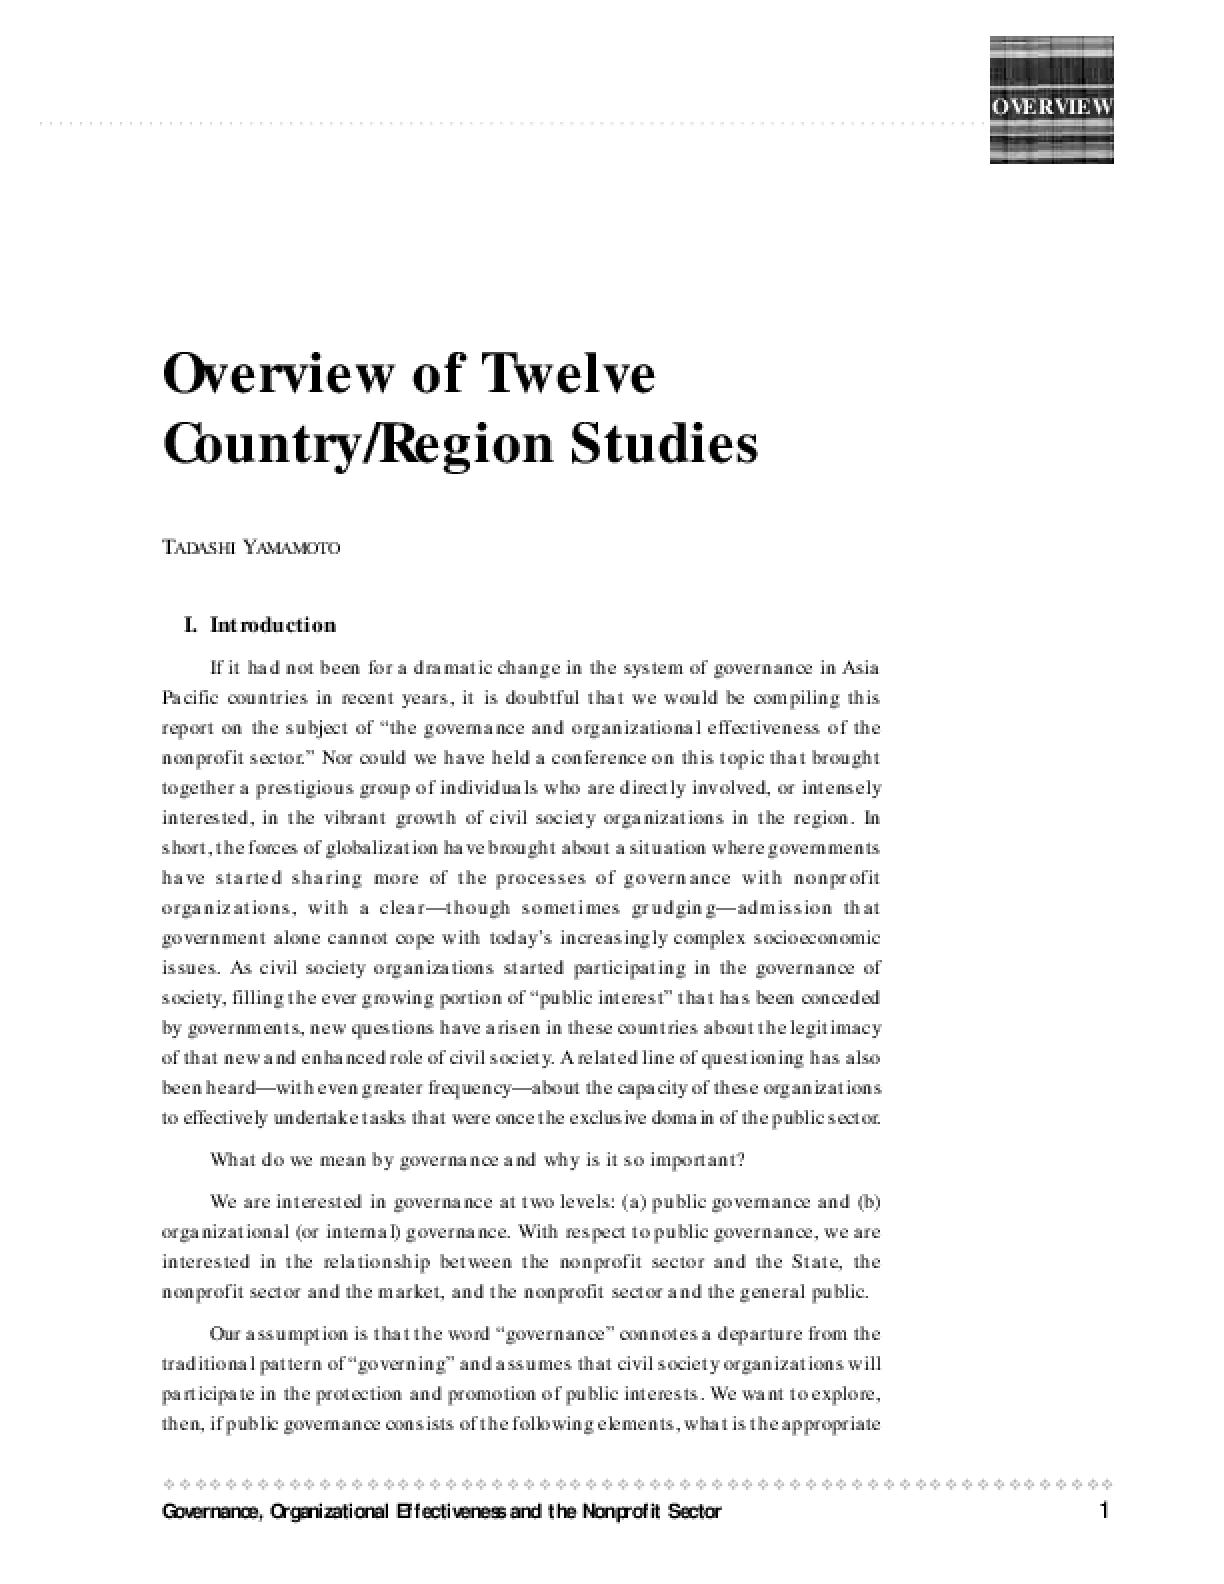 Overview of Twelve Country/region Studies